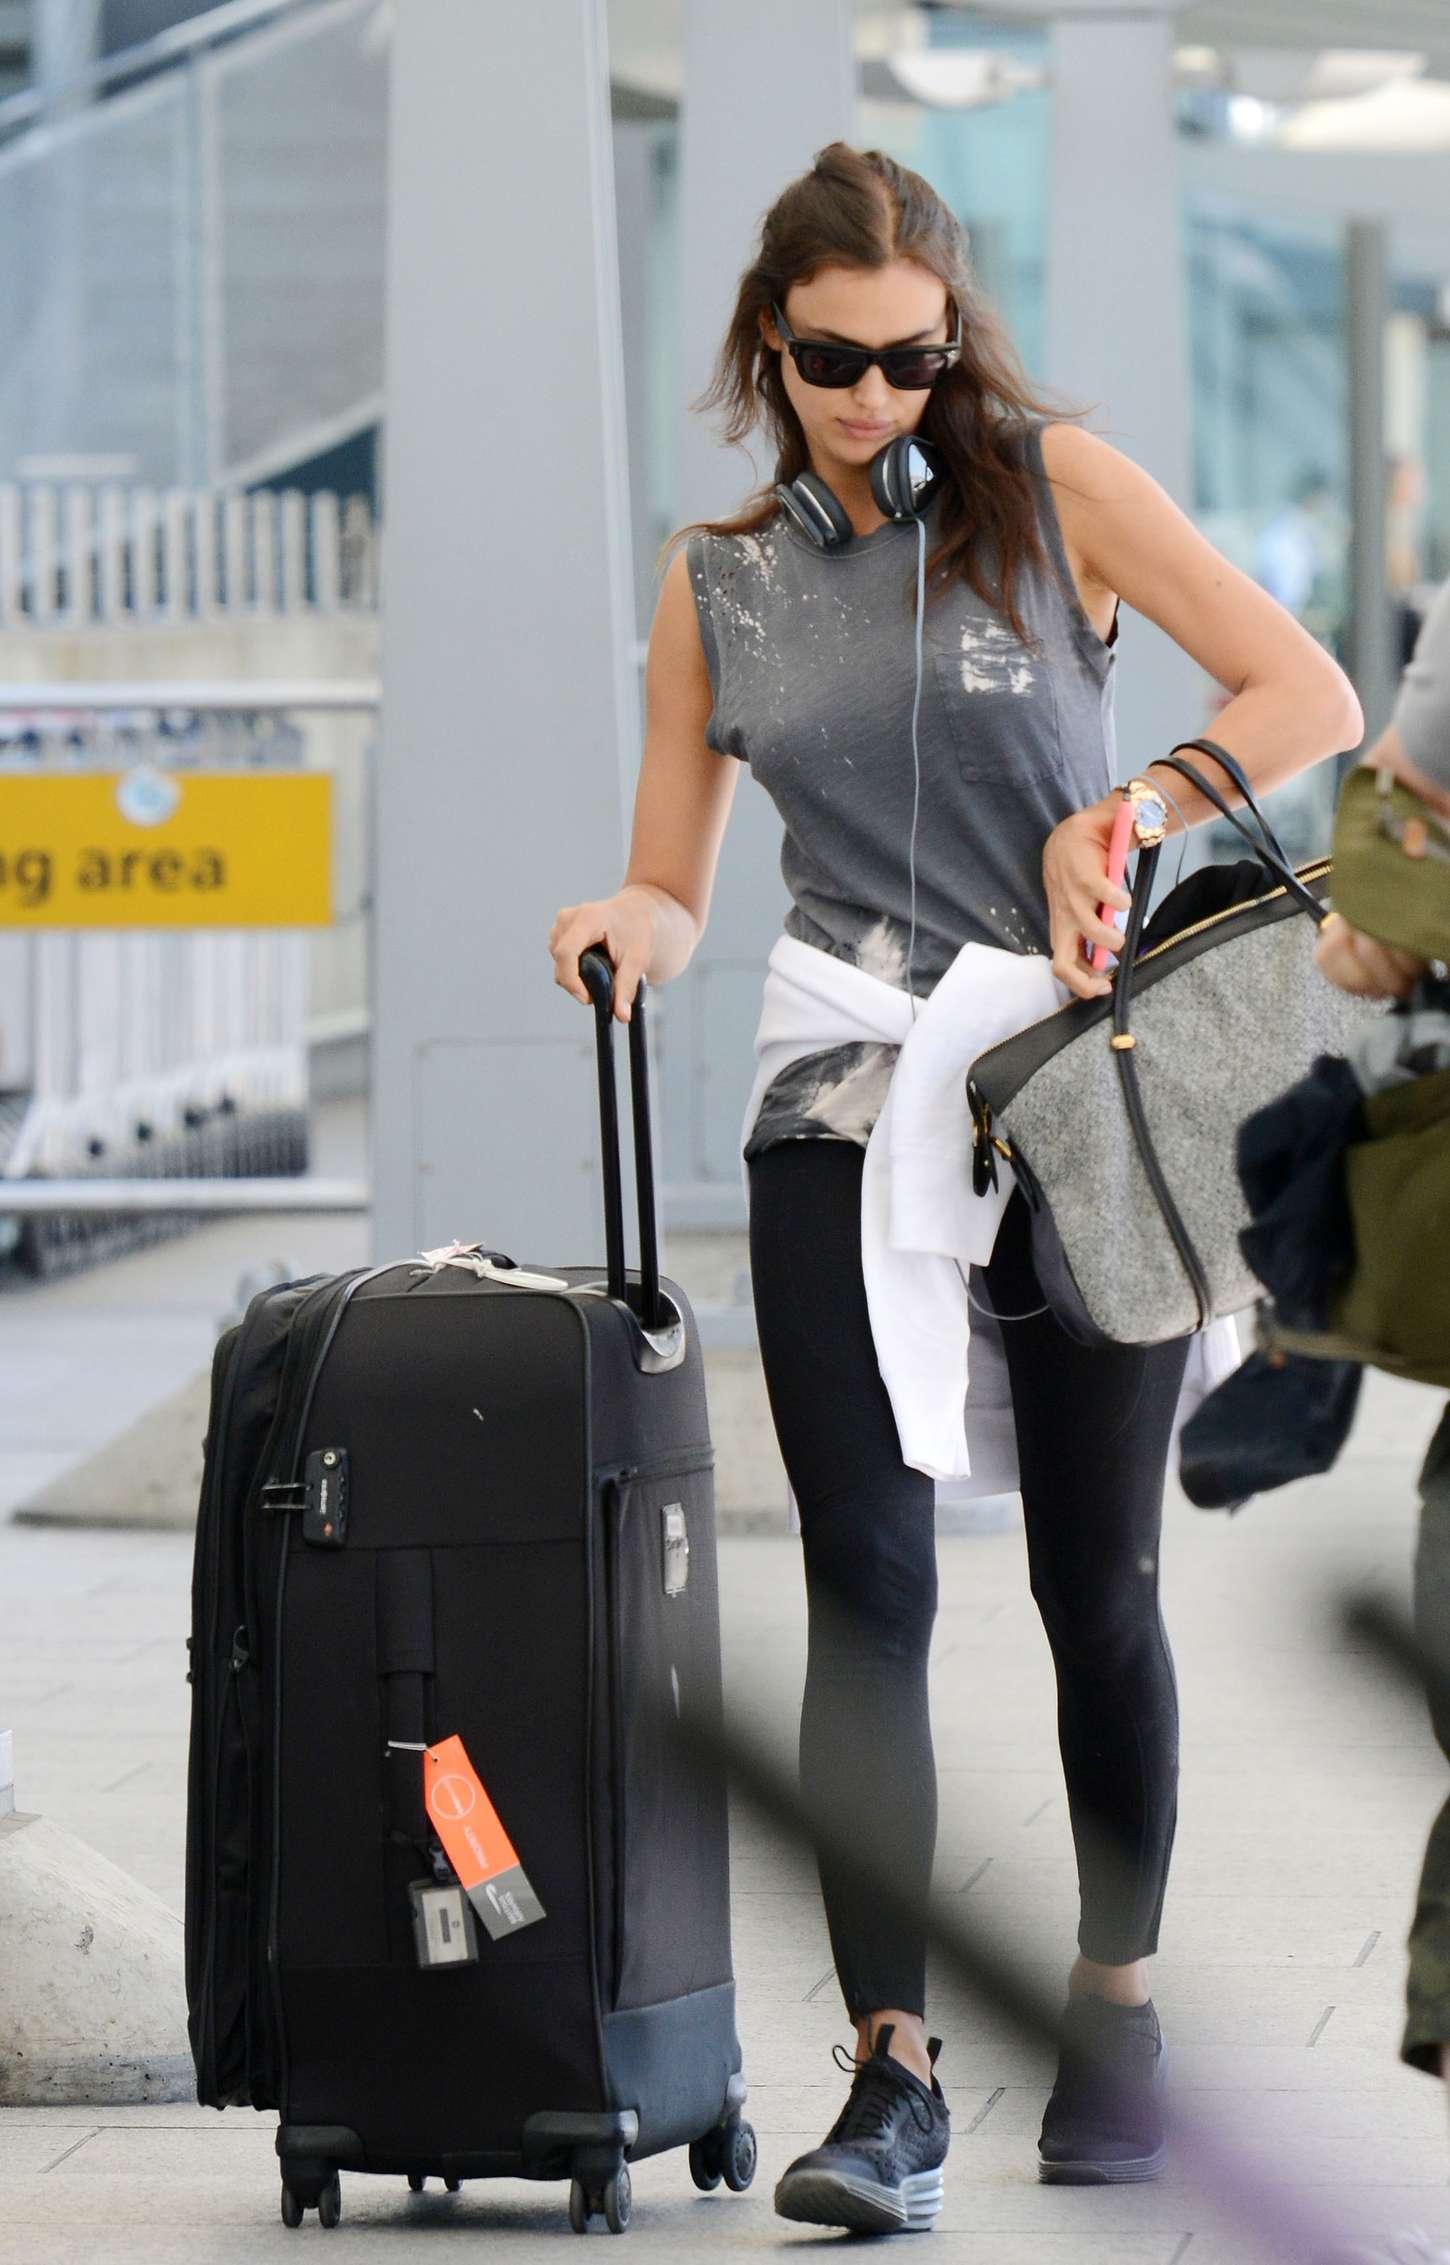 Irina Shayk 2015 : Irina Shayk in Leggings at Heathrow airport -04